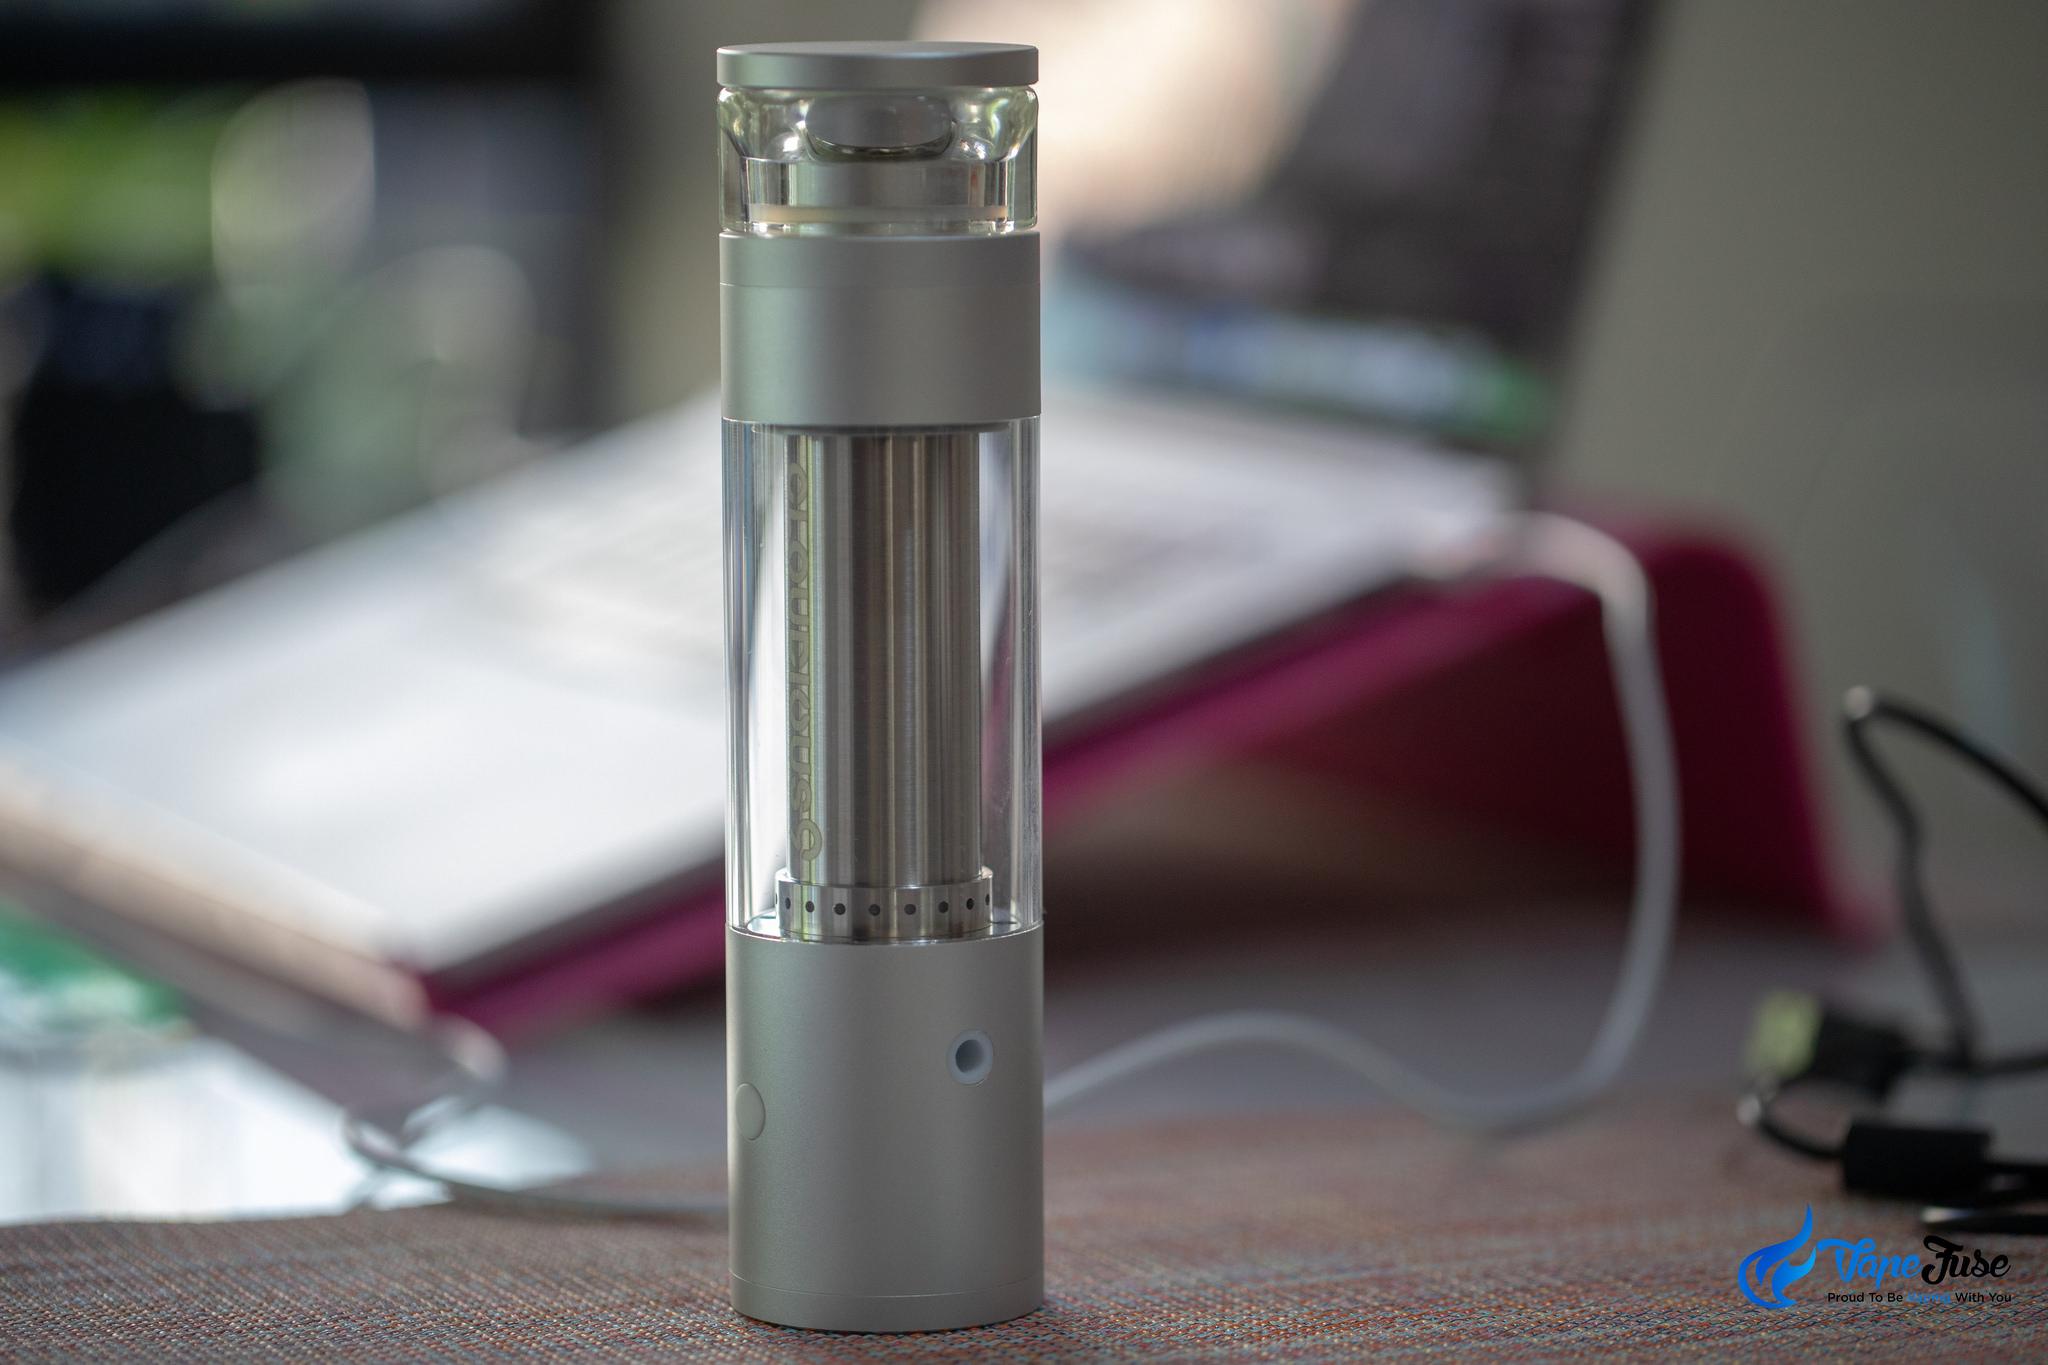 VapeFuse First Look: Hydrology9 Premium Portable Vape